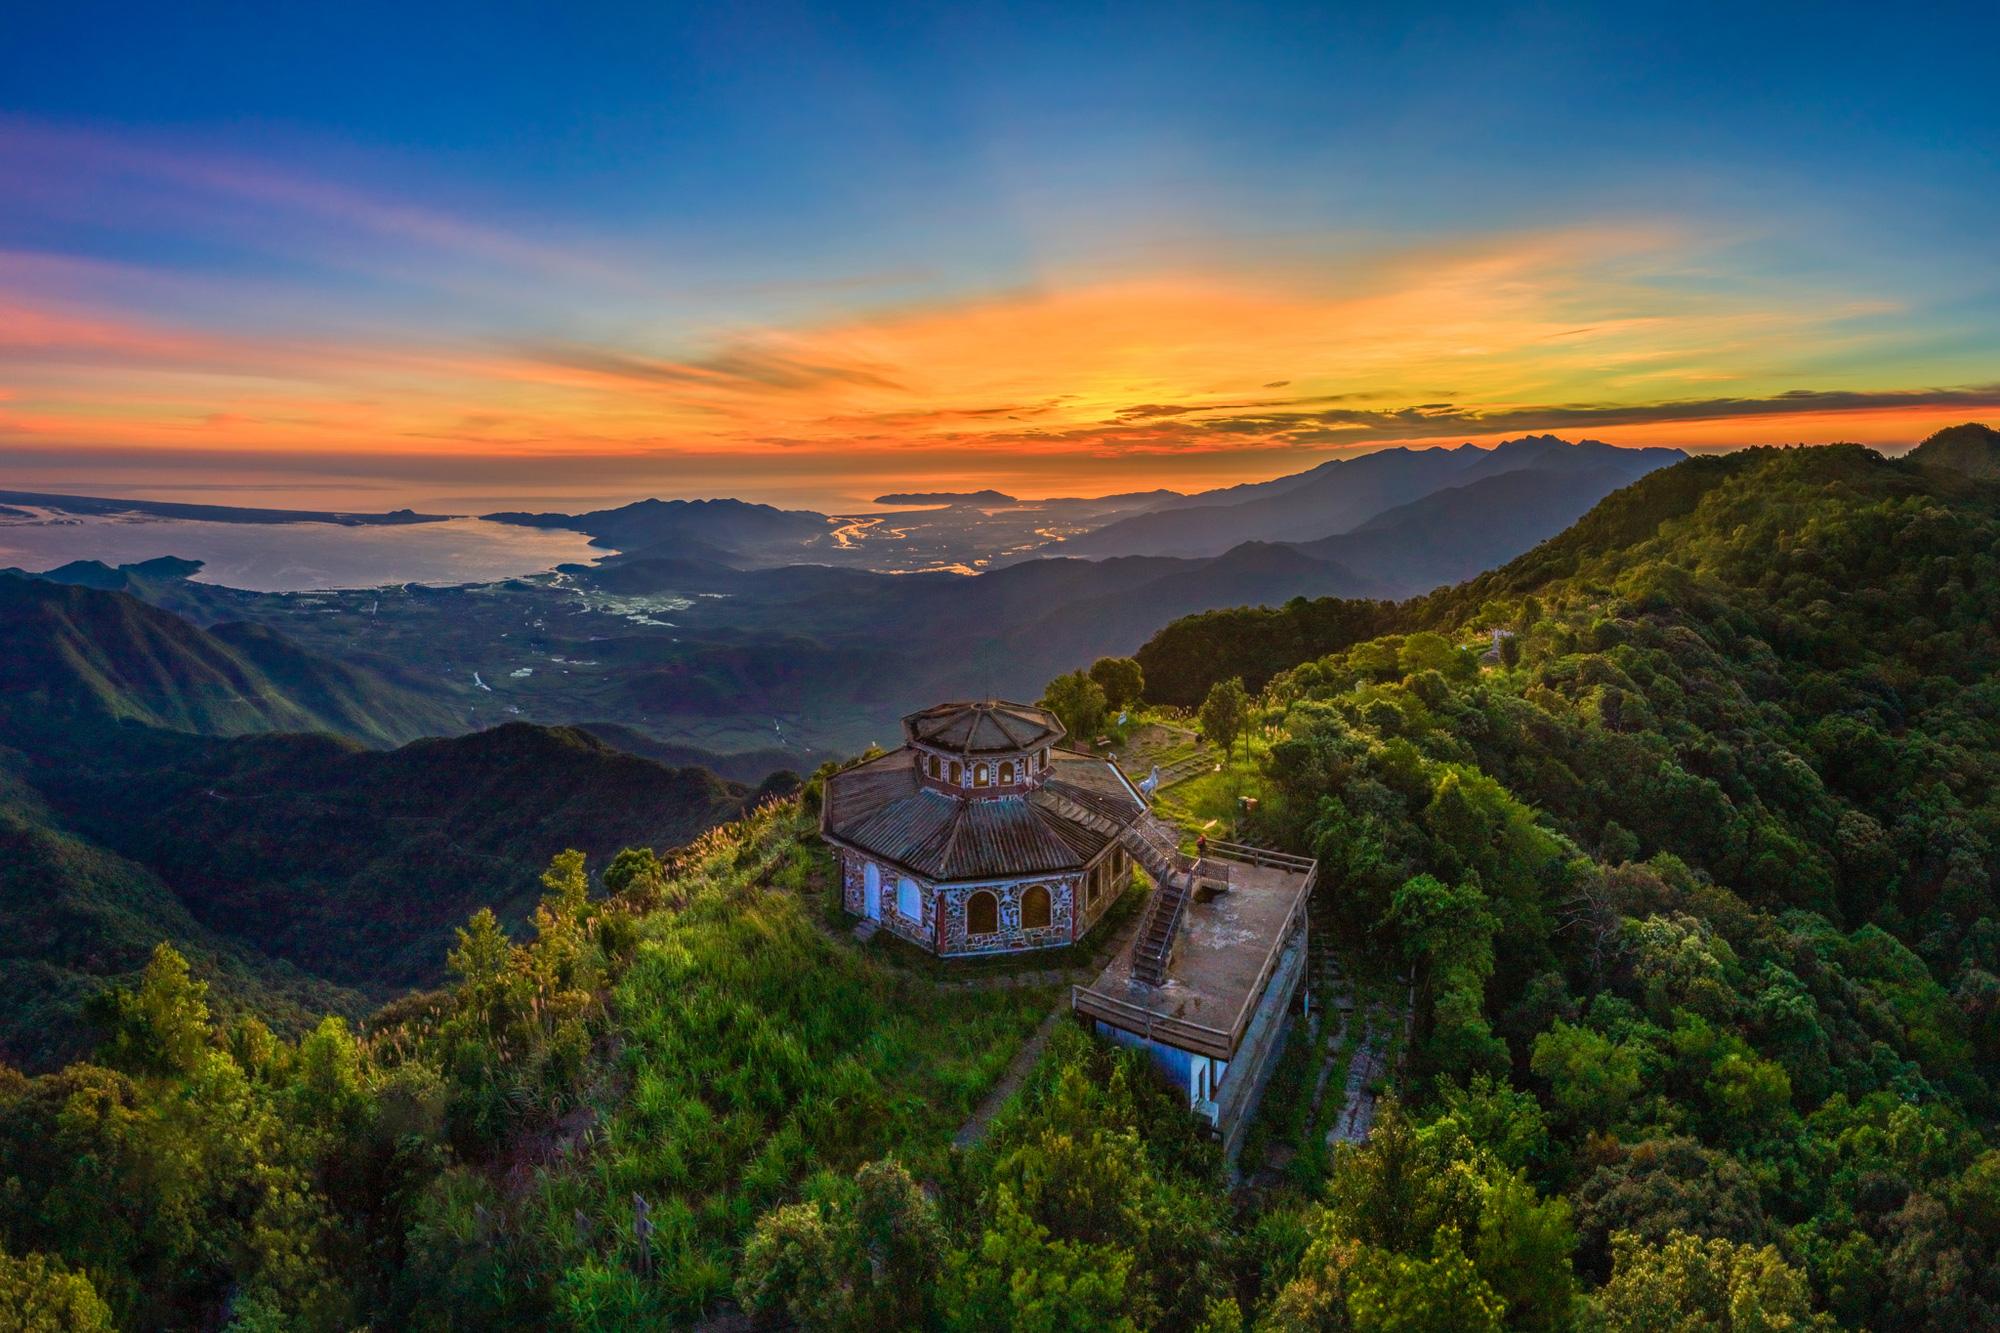 Enjoy stunning sunrise, sunset on central Vietnam's Bach Mapeak